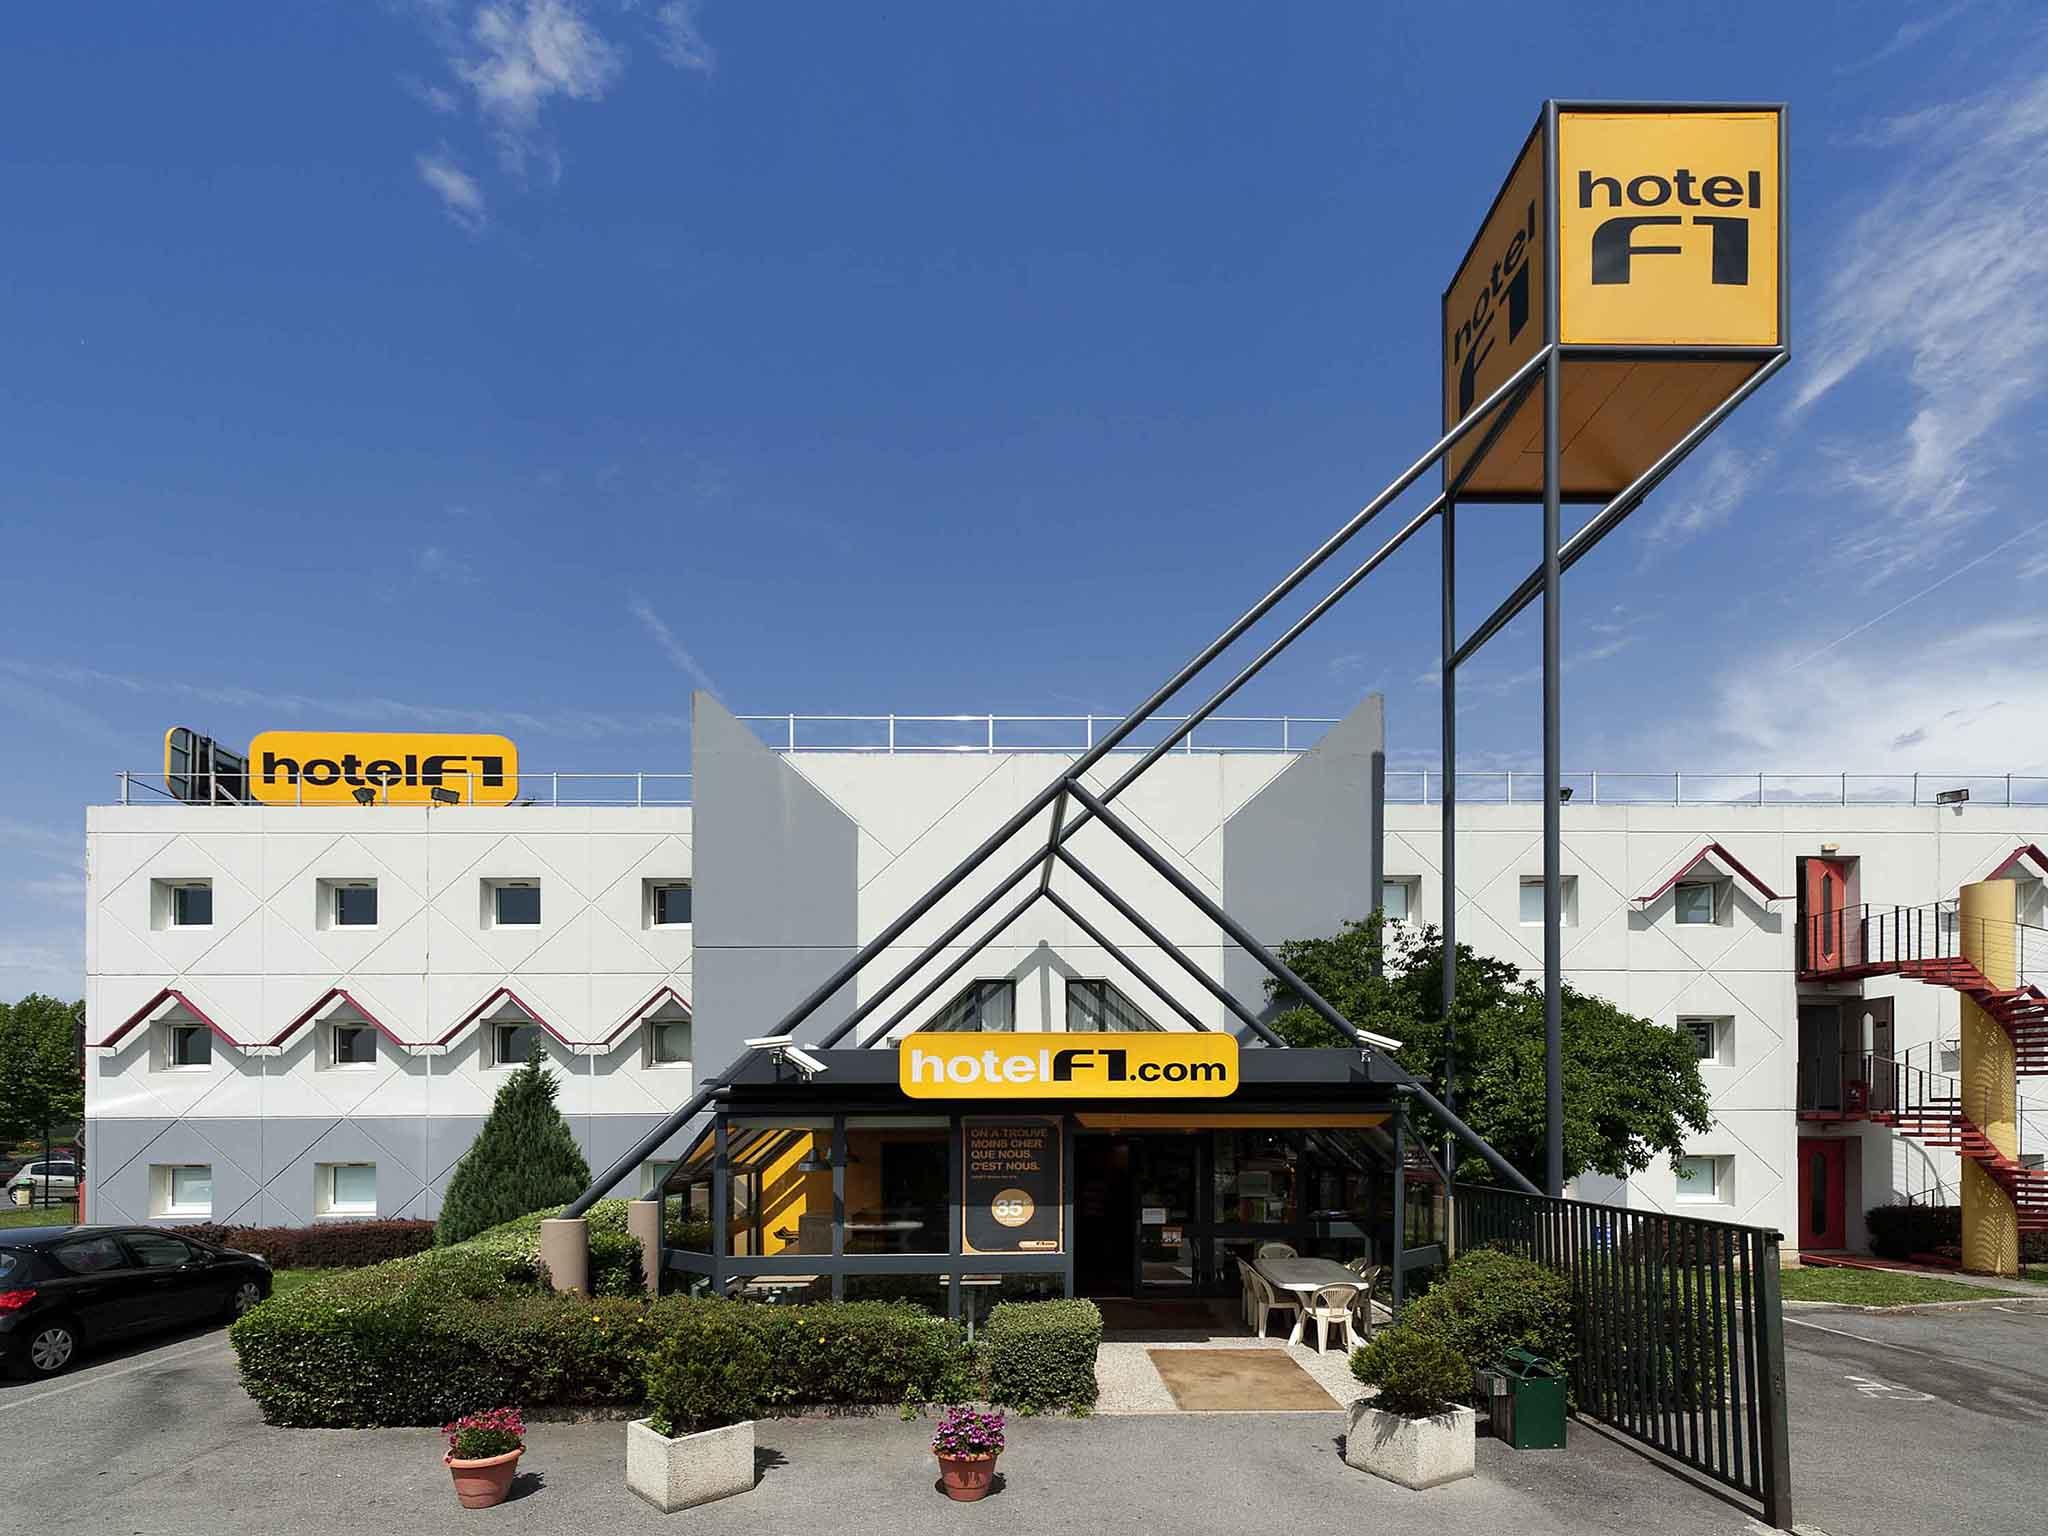 Отель — hotelF1 Sochaux Montbéliard